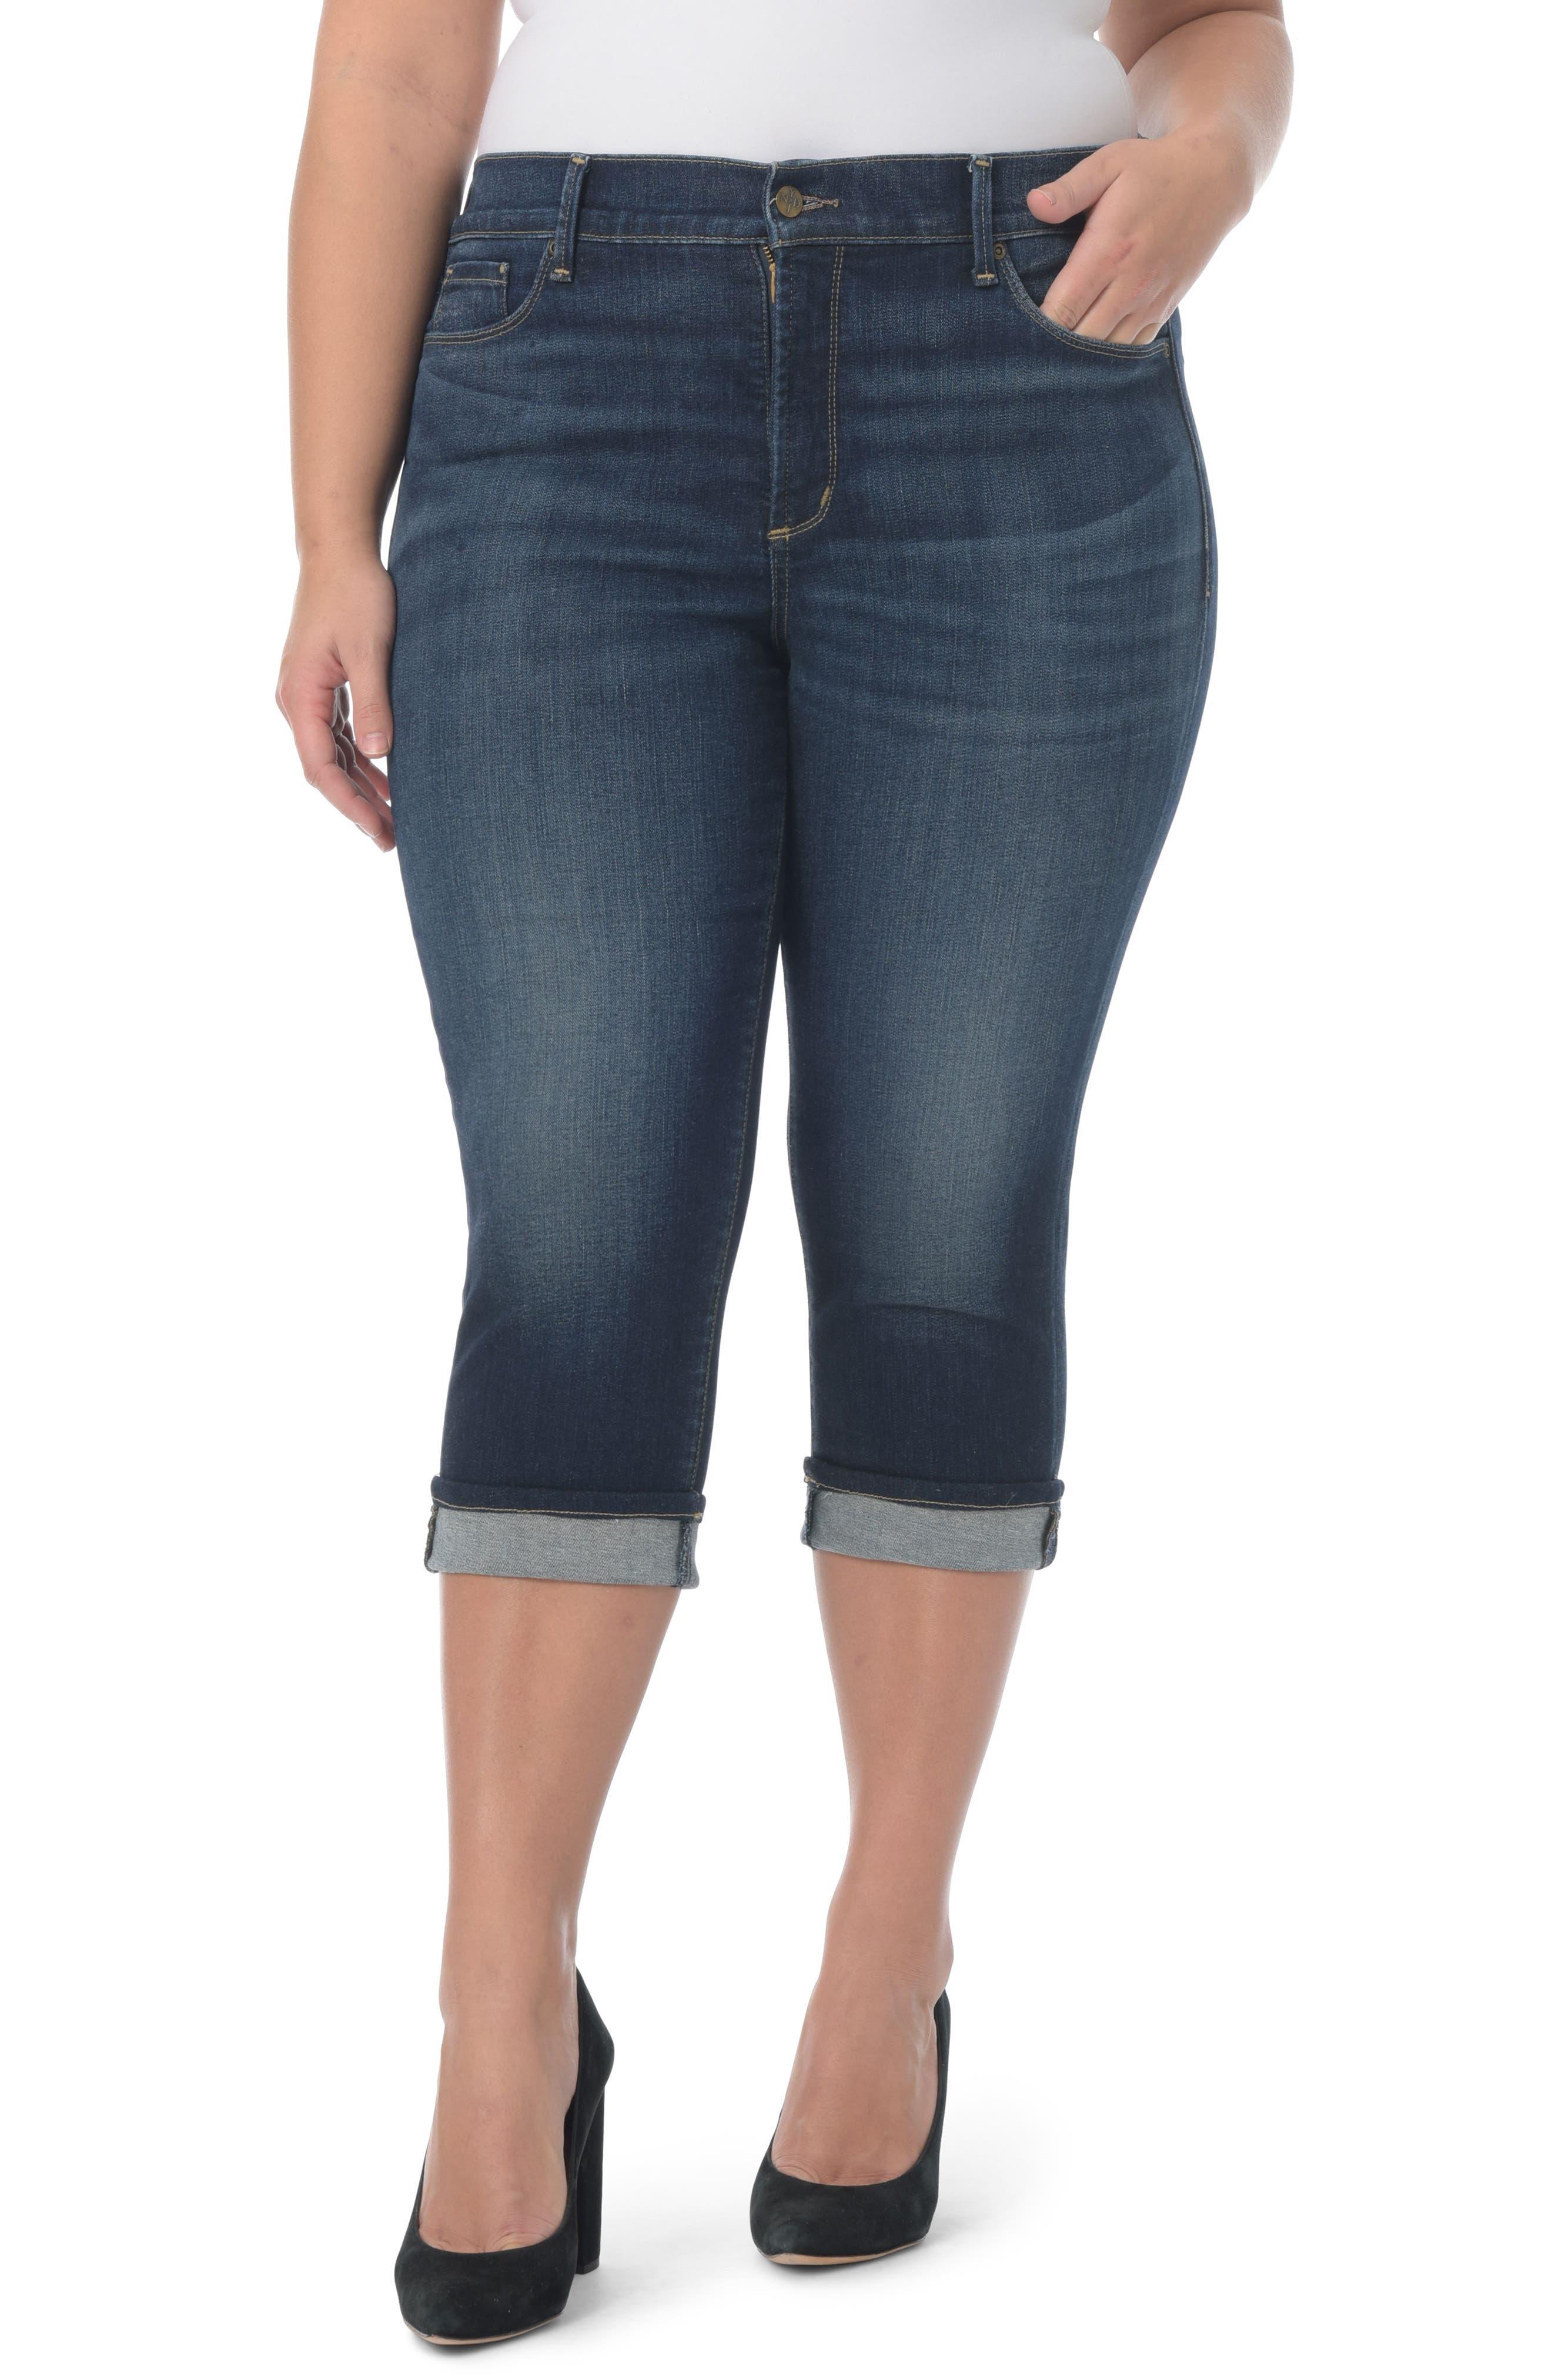 NYDJ, Marilyn Crop Cuff Jeans, Main thumbnail 1, color, BEZEL